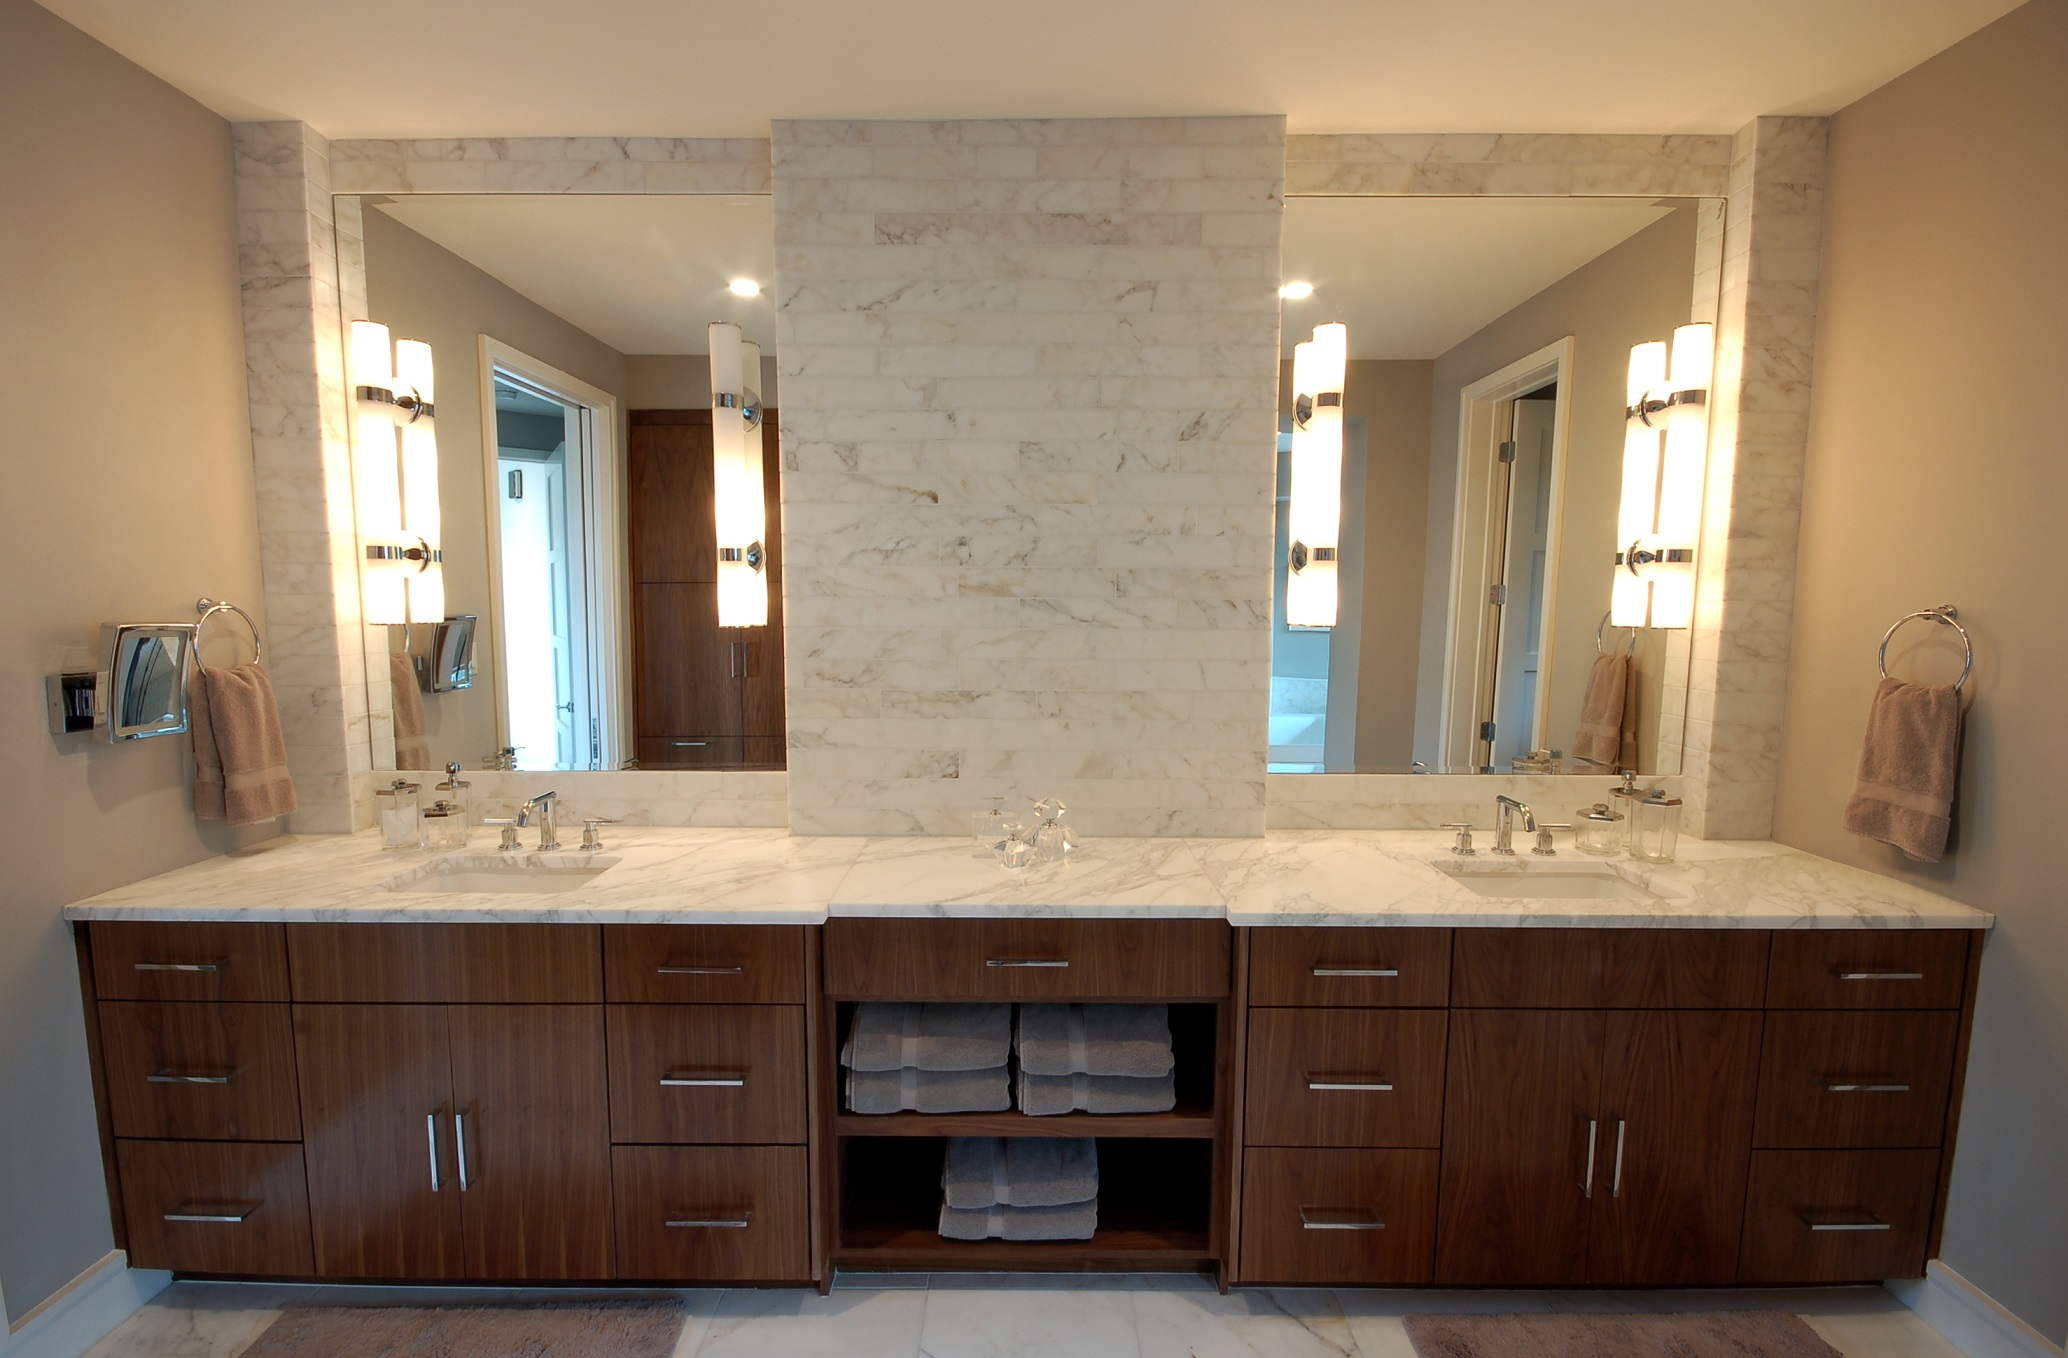 cortona-master-bath-sink